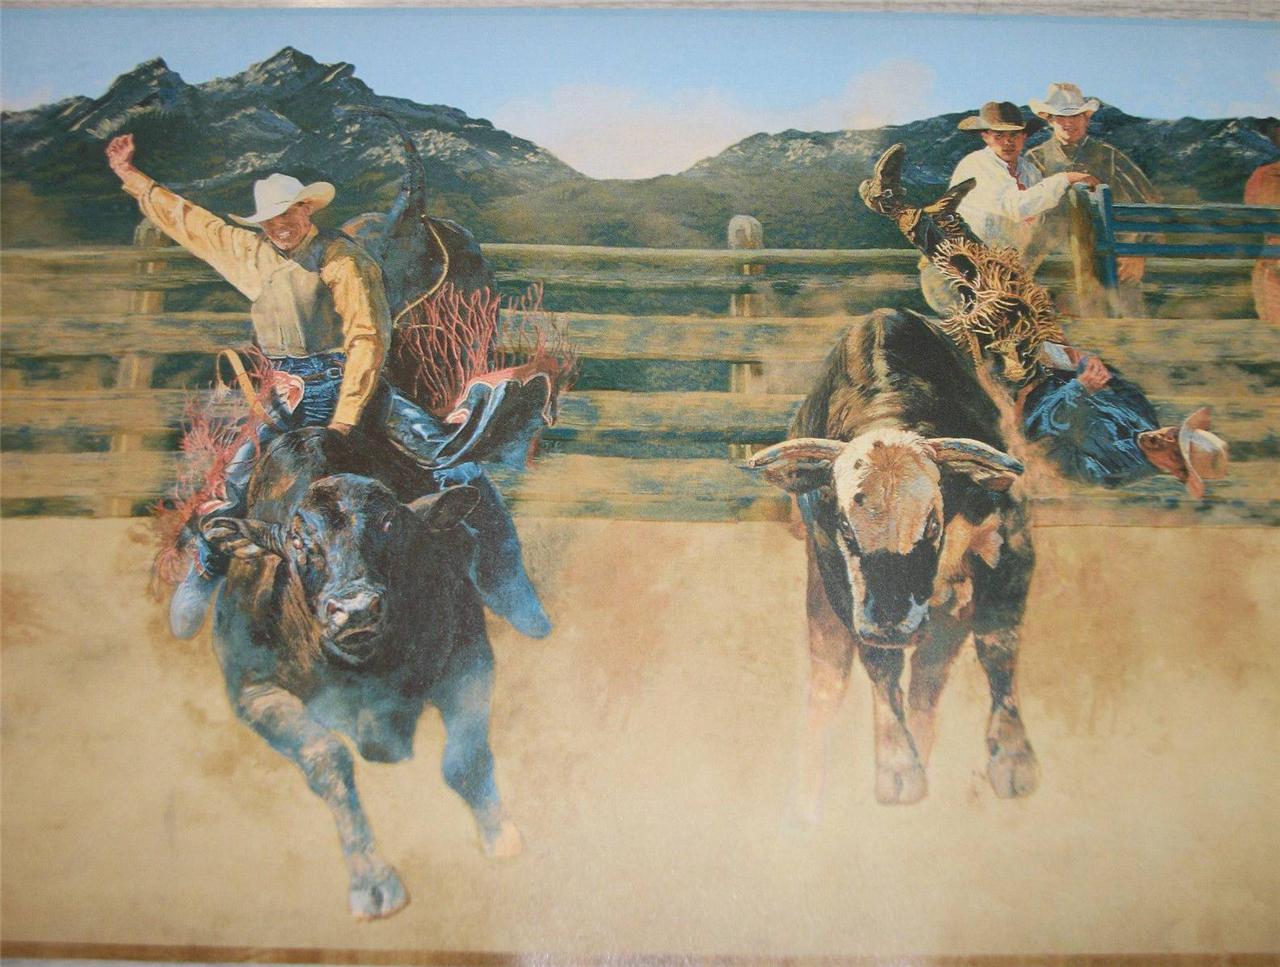 wallpaper border western cowboys bull riding bucking